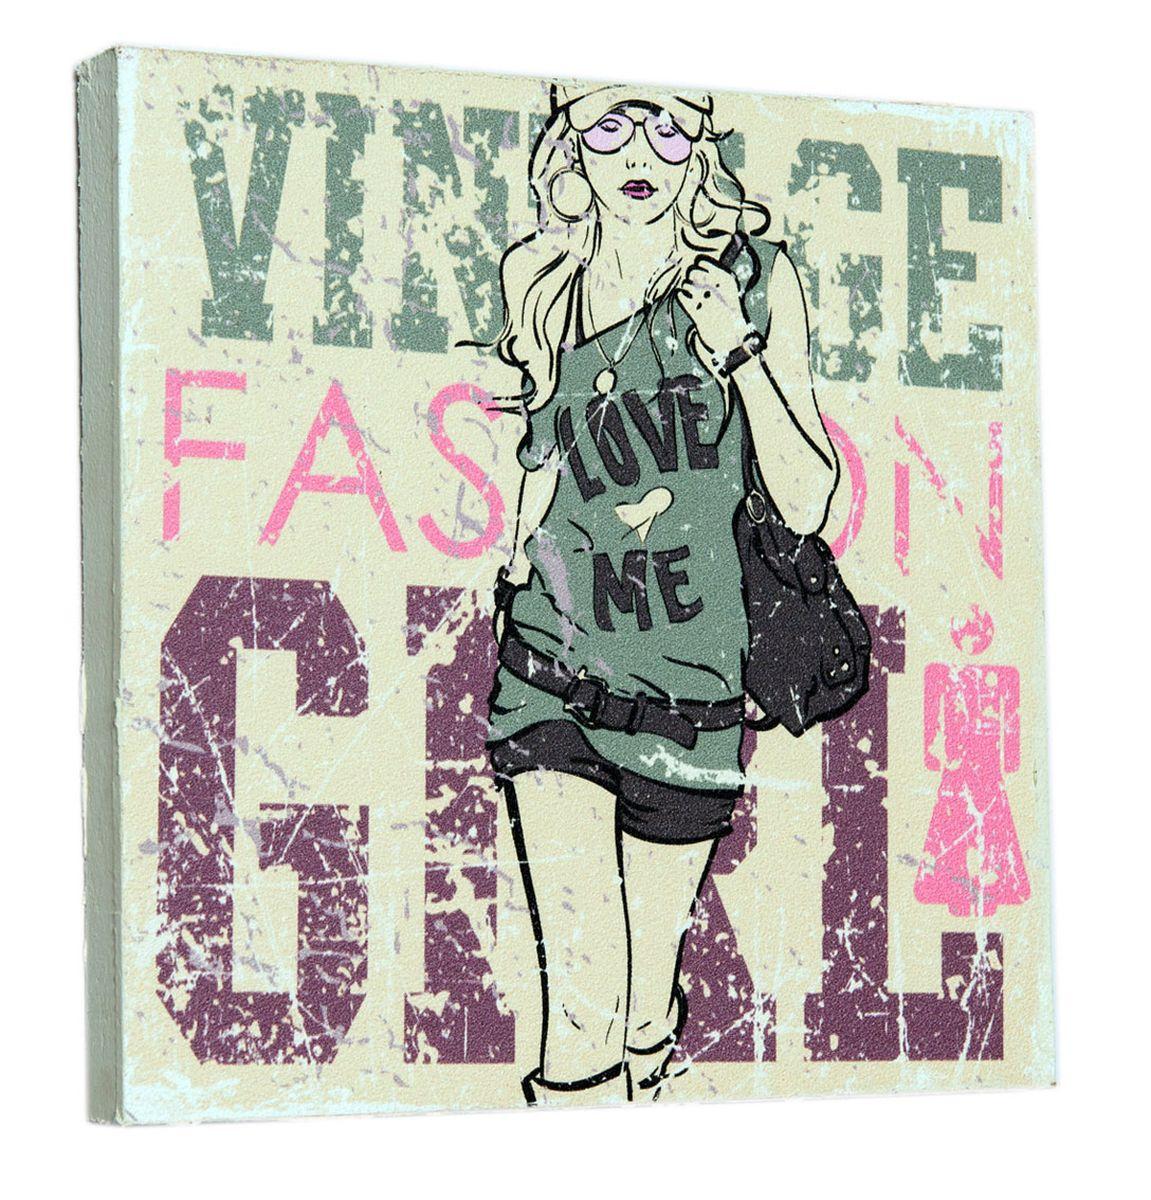 Картина Mister Poster Девушка с обложки 2, 22 х 22 см картина mister poster розовые цветы вишни 22 х 14 5 см